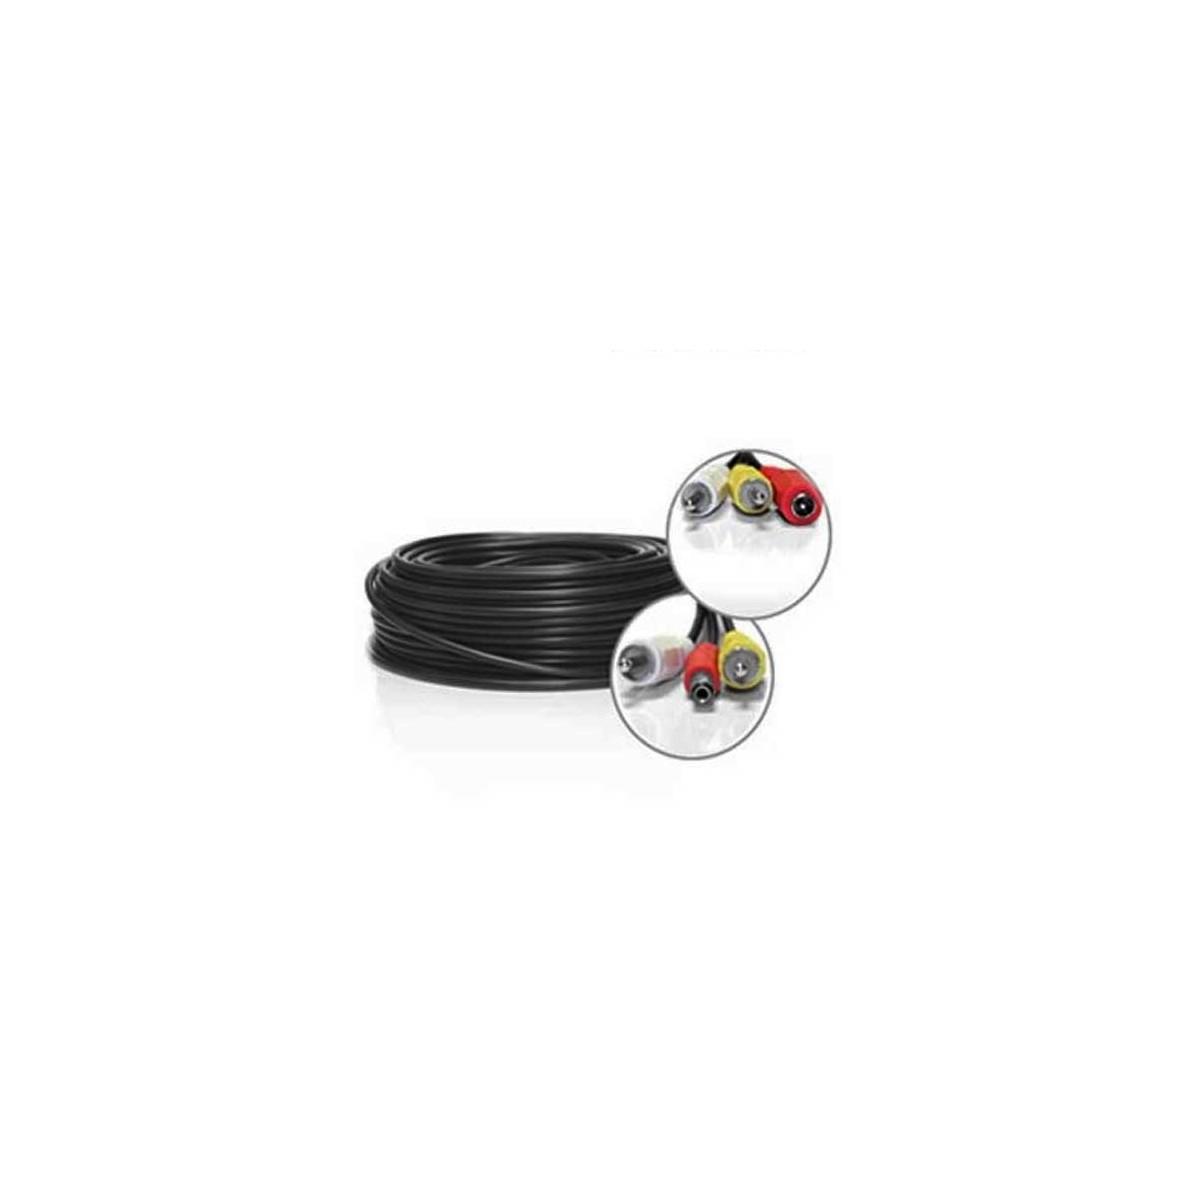 Cable rca video audio alimentation 30m